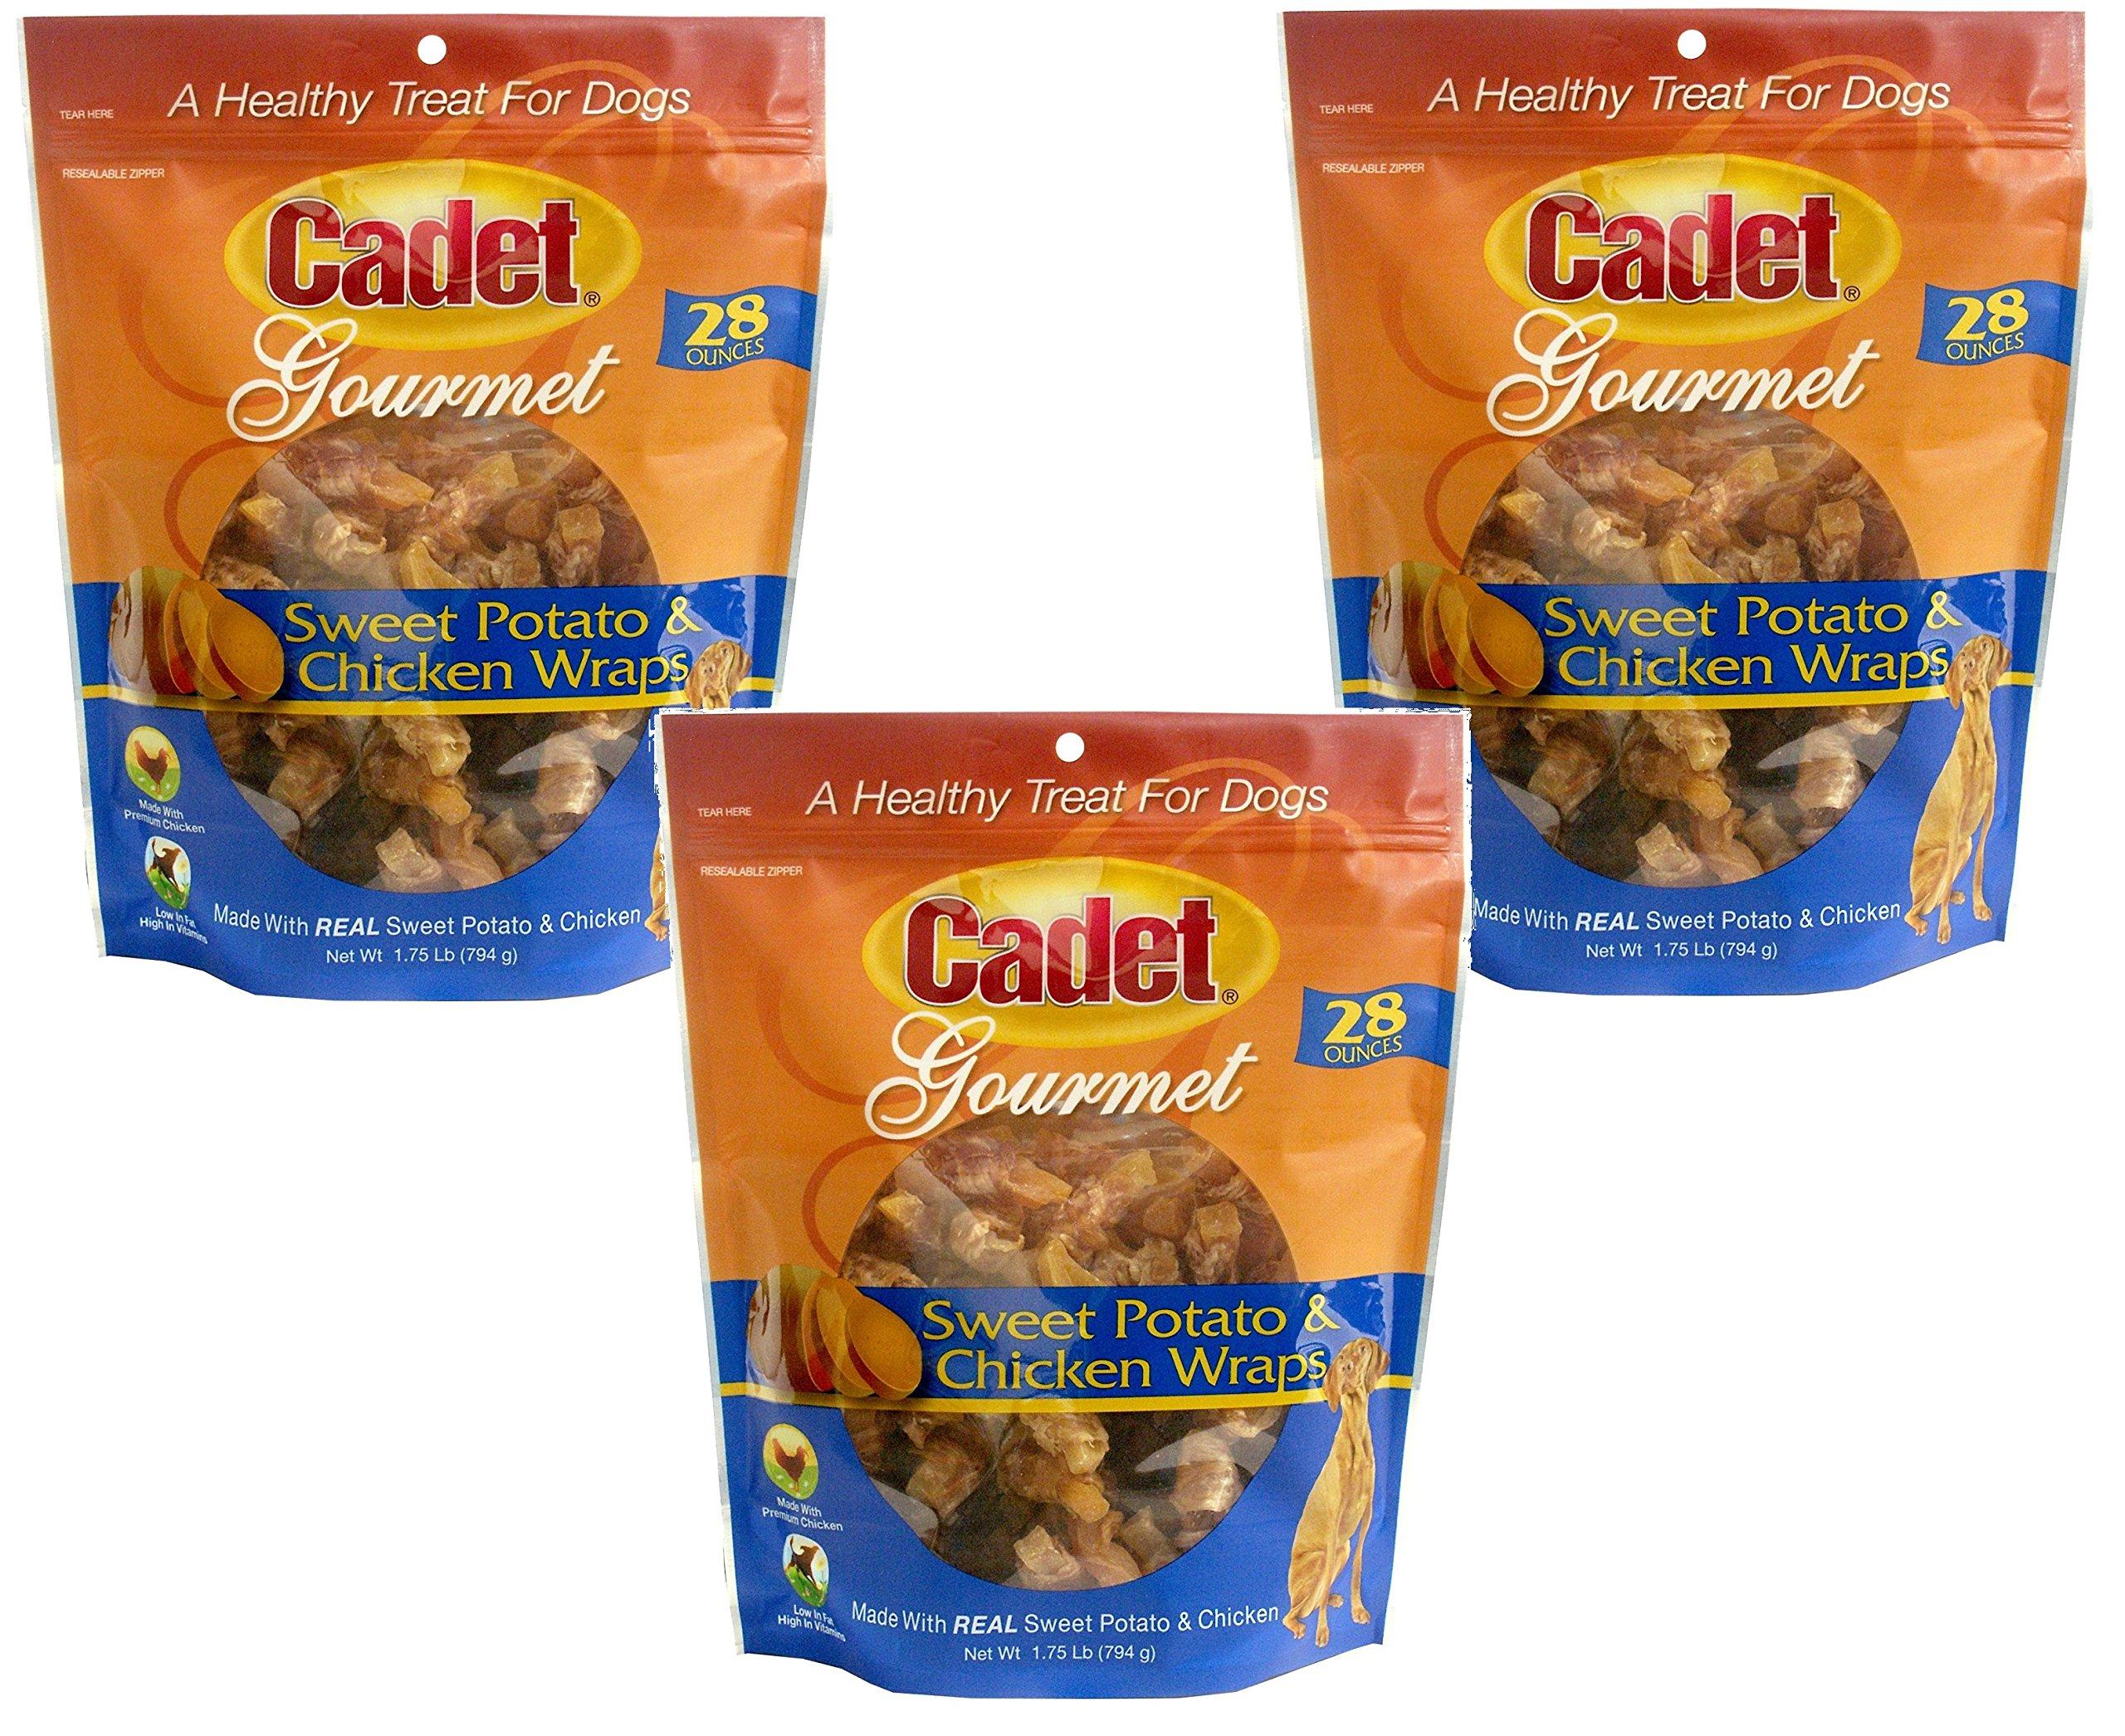 (3 Pack) Cadet Chicken & Sweet Potato Dog Treat Wraps; 28 oz Each by Cadet